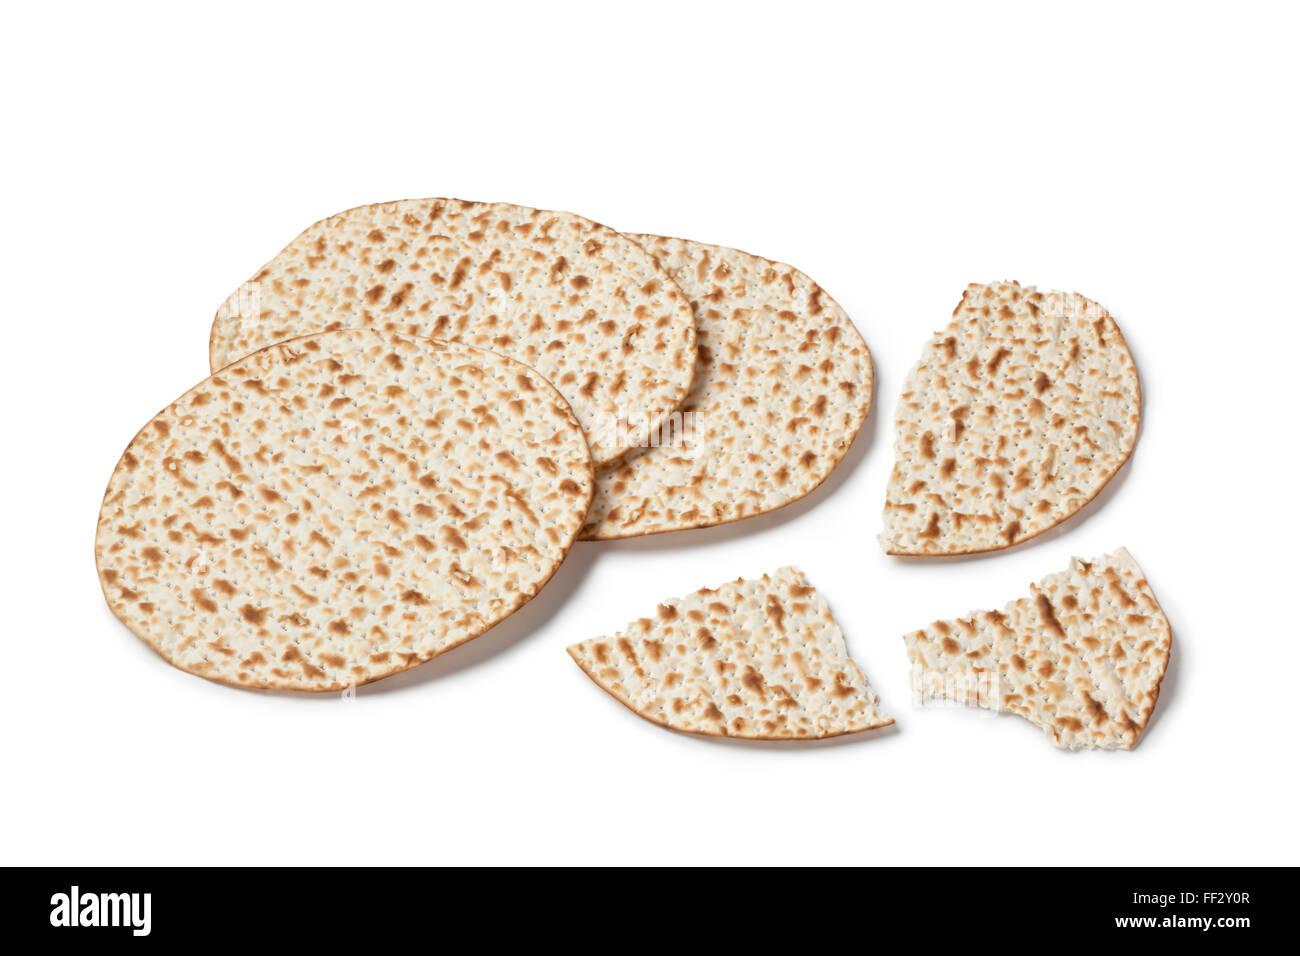 Fresh matzo on white background - Stock Image